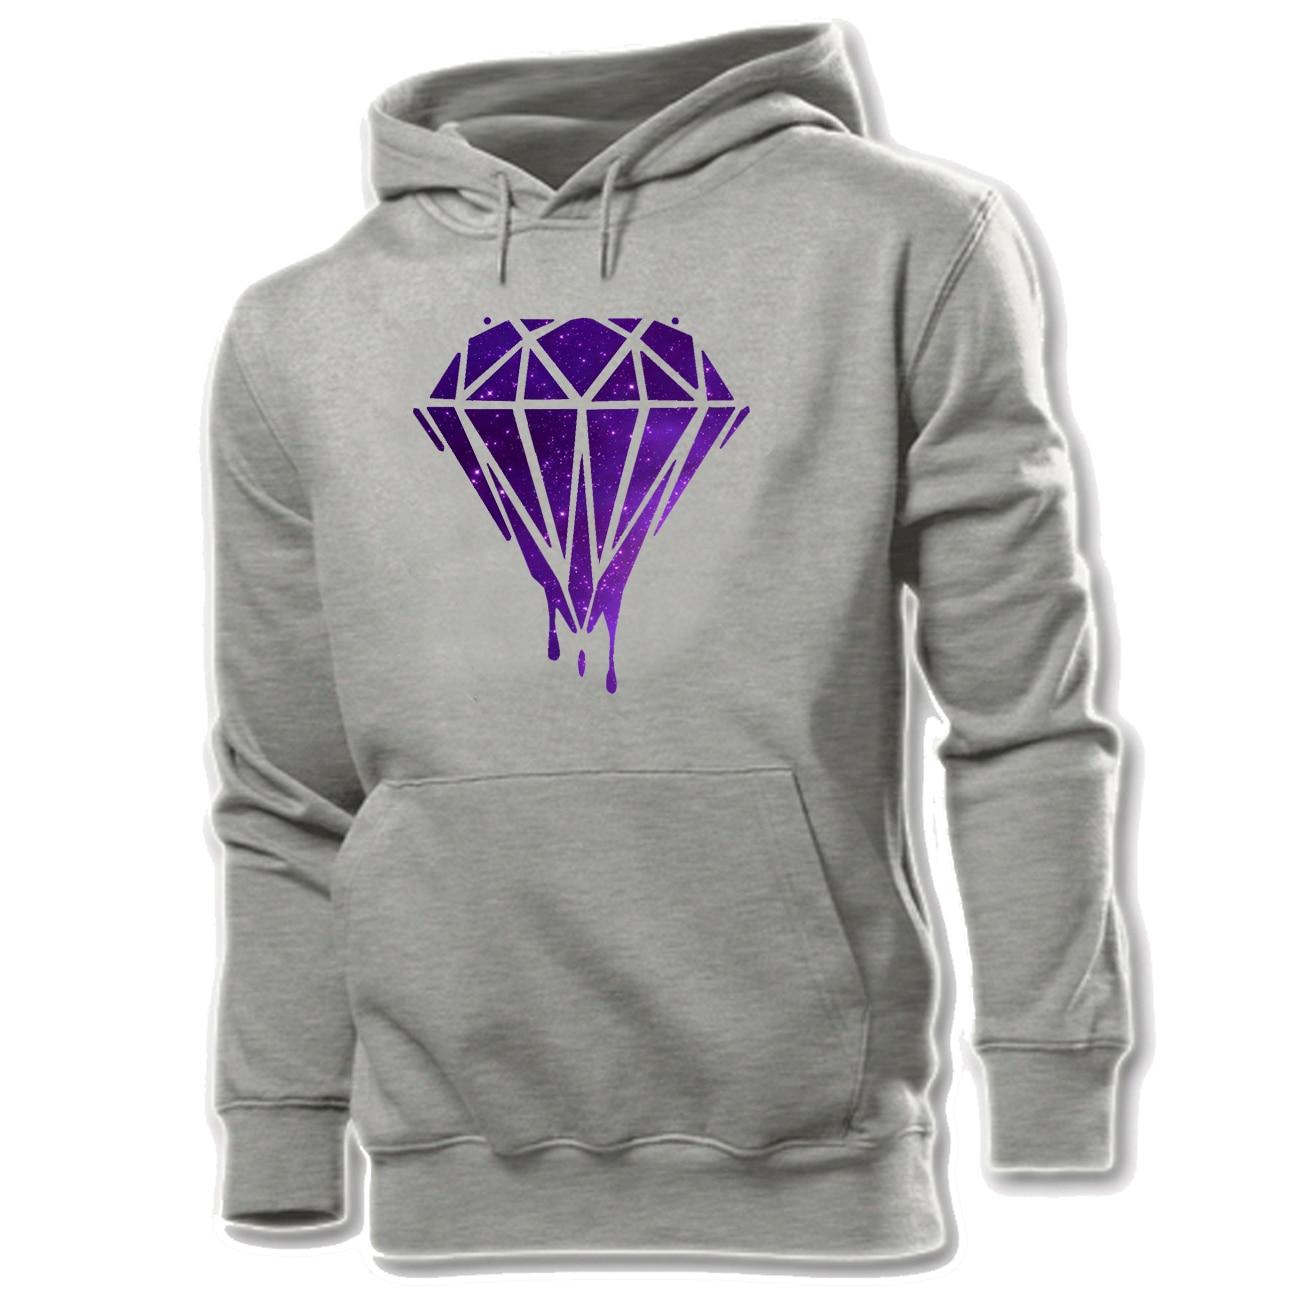 Boys Purple Sweatshirt Promotion-Shop for Promotional Boys Purple ...